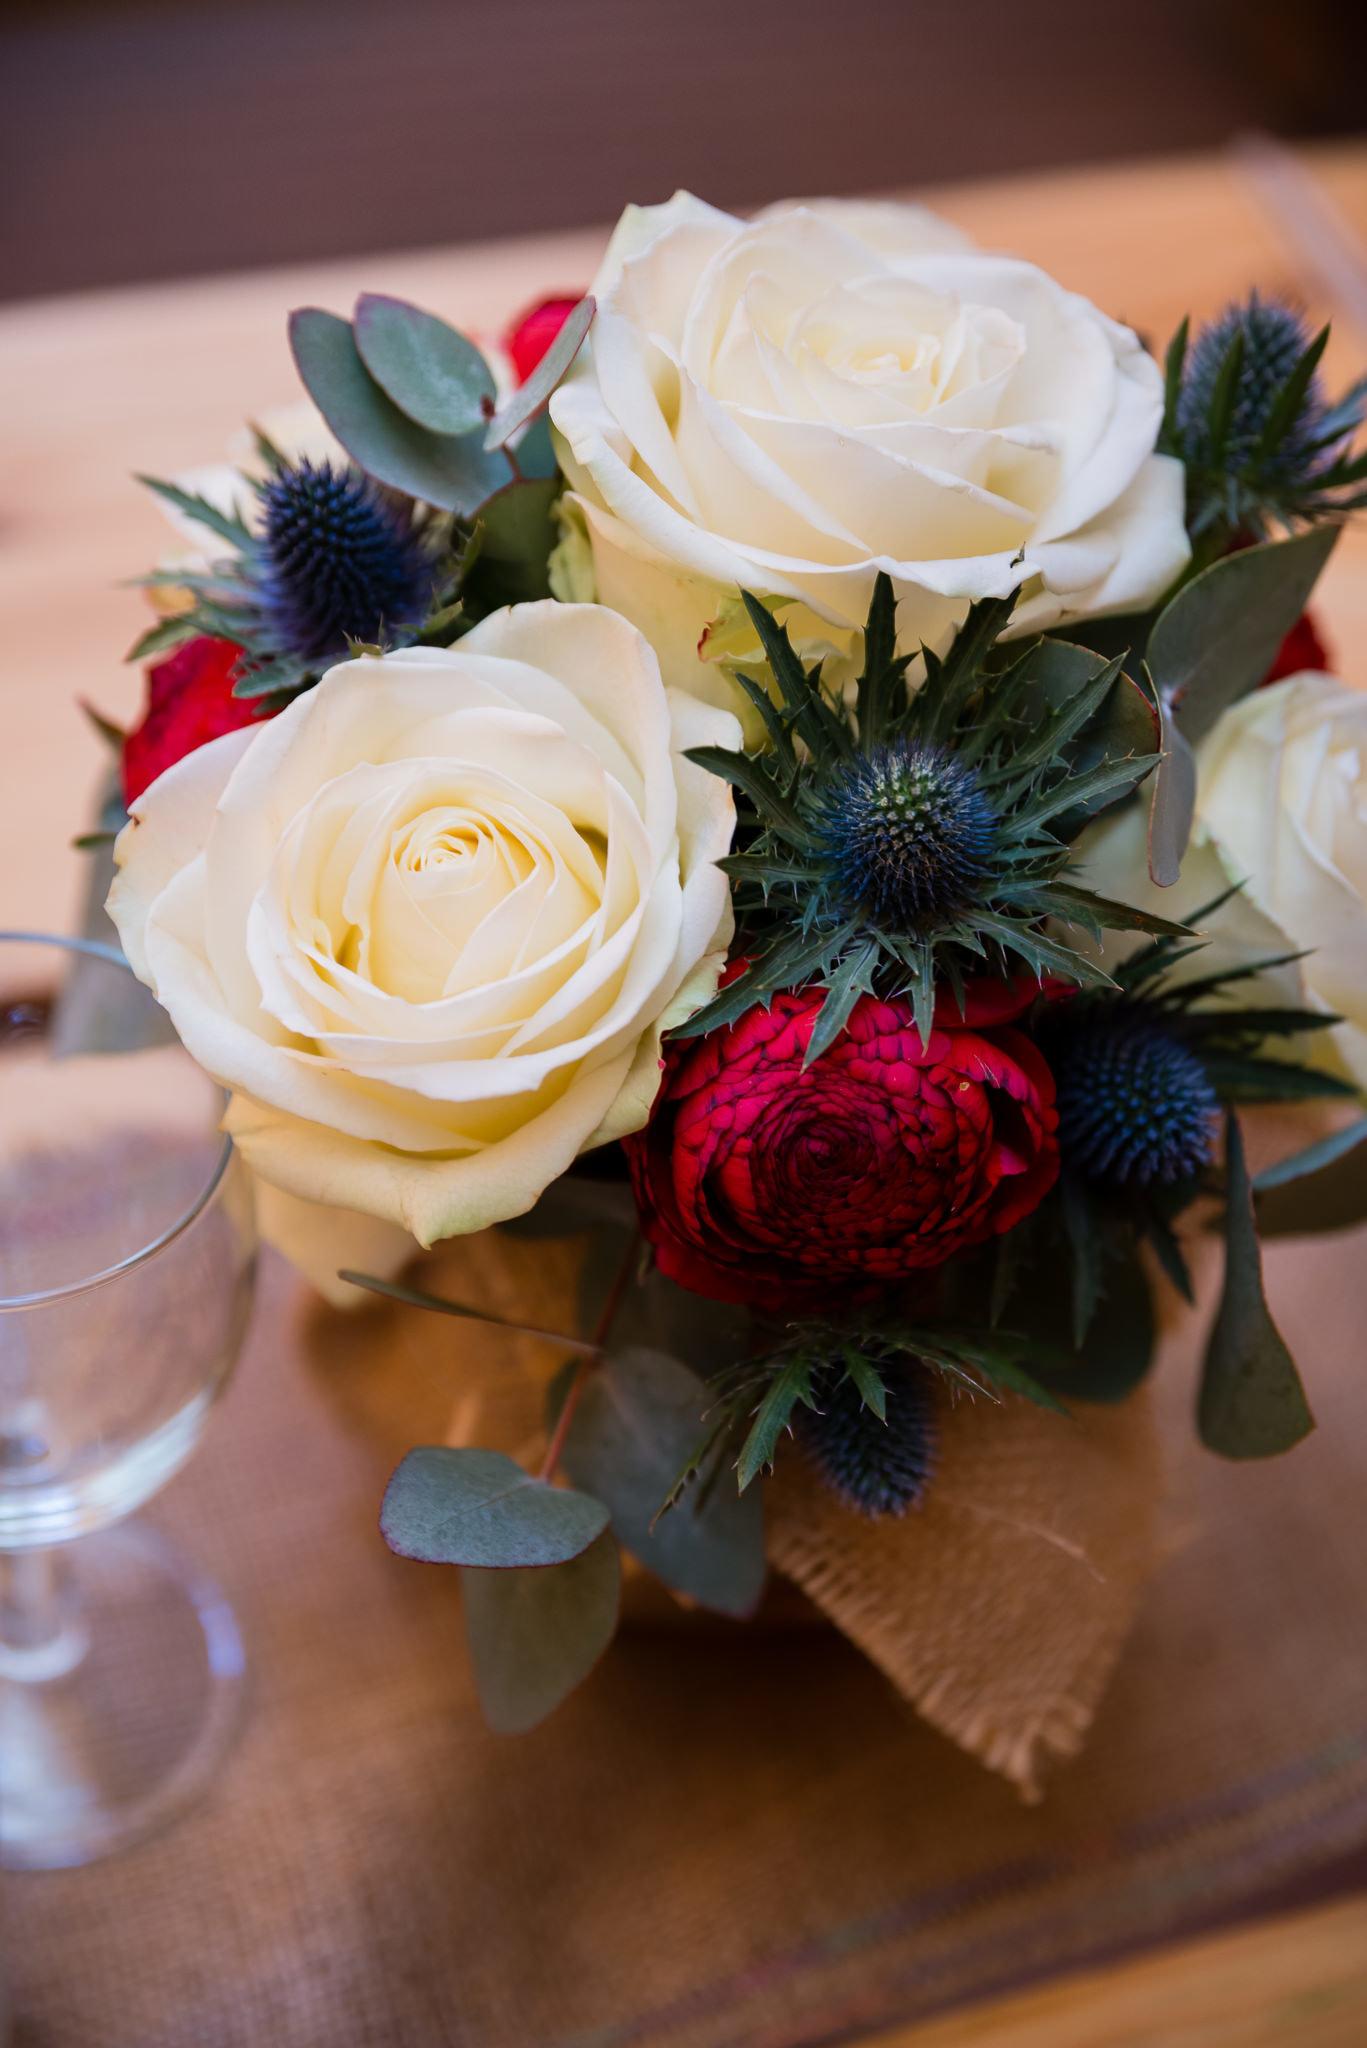 Wedding flowers at the tipi wedding